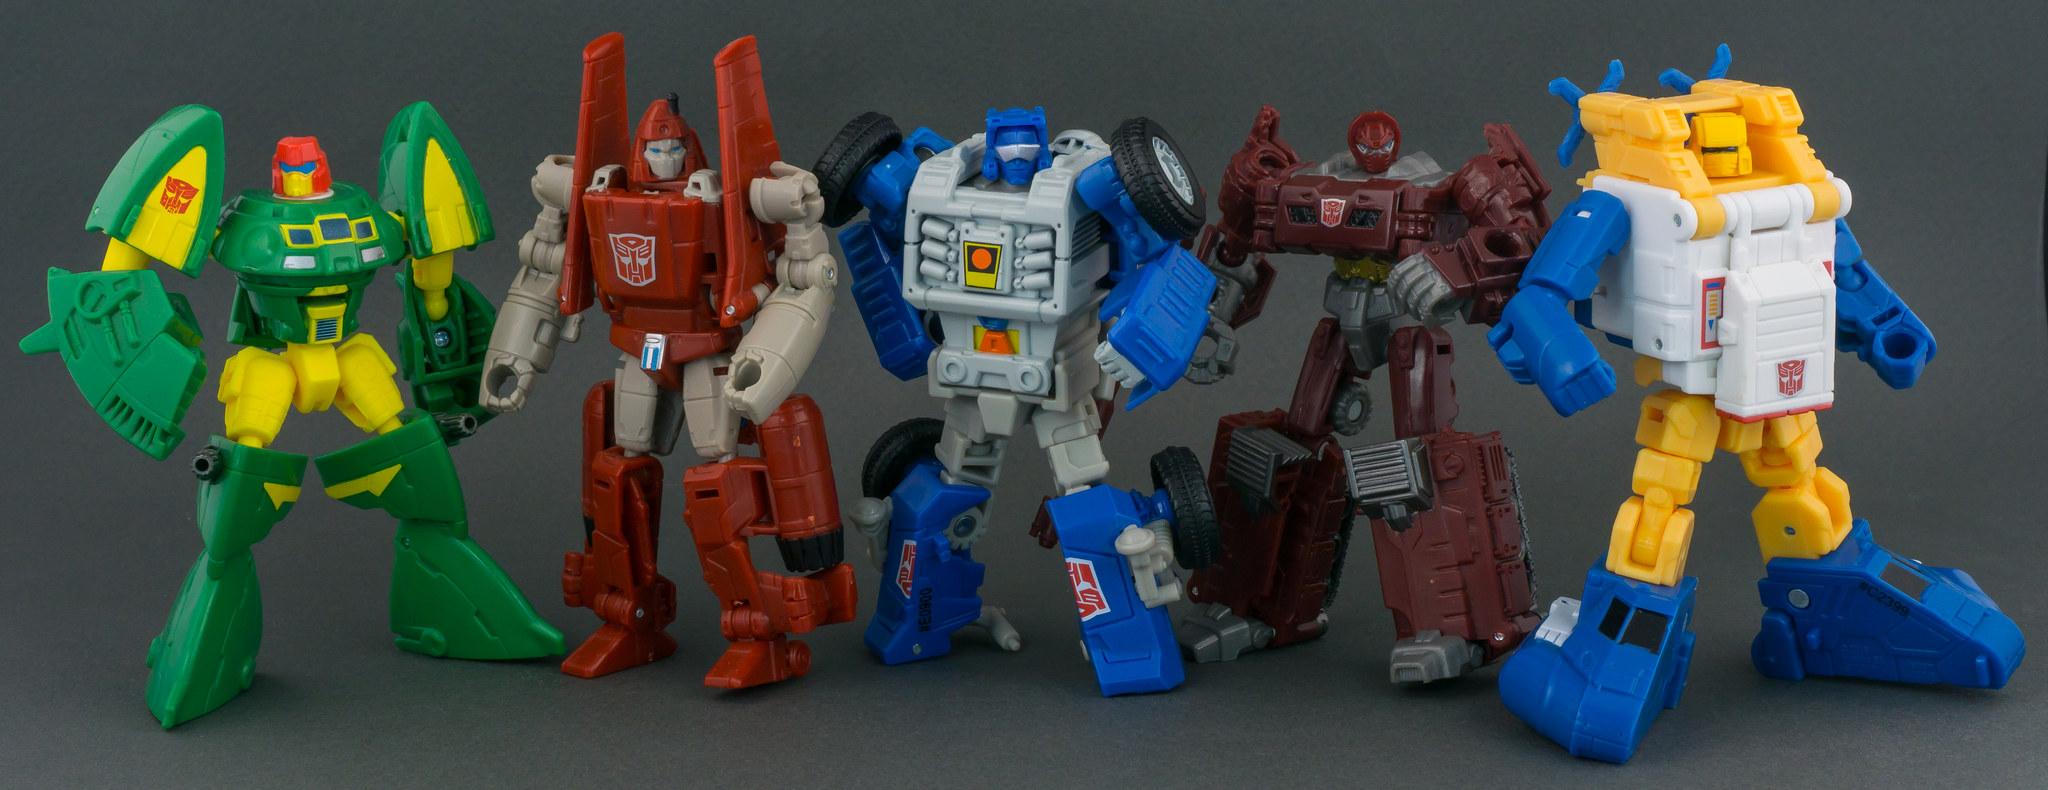 Transformers Power Of The Primes Legend Beachcomber